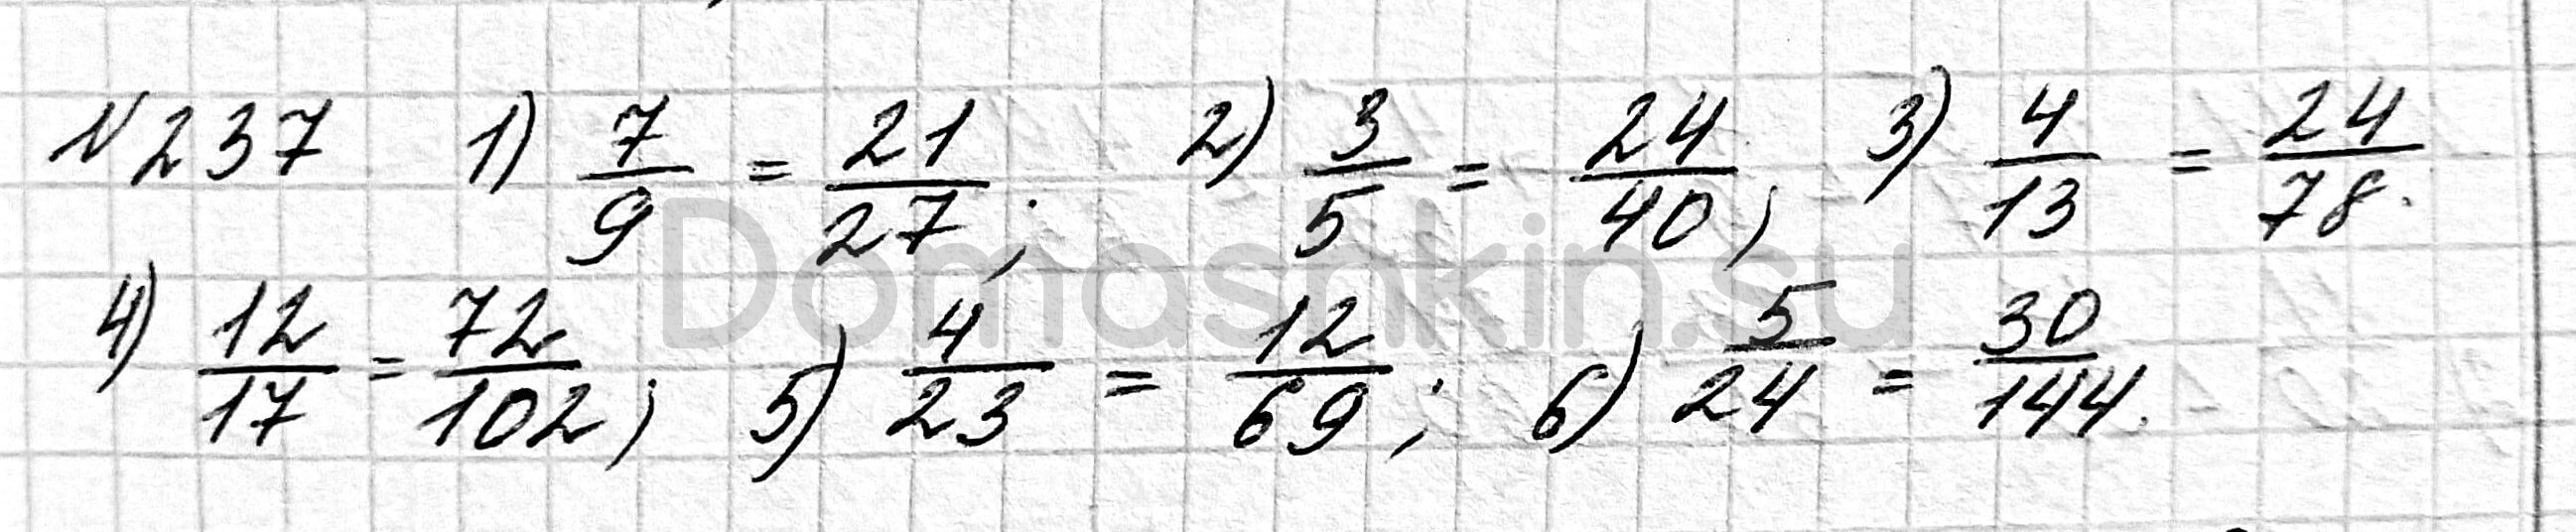 Математика 6 класс учебник Мерзляк номер 237 решение